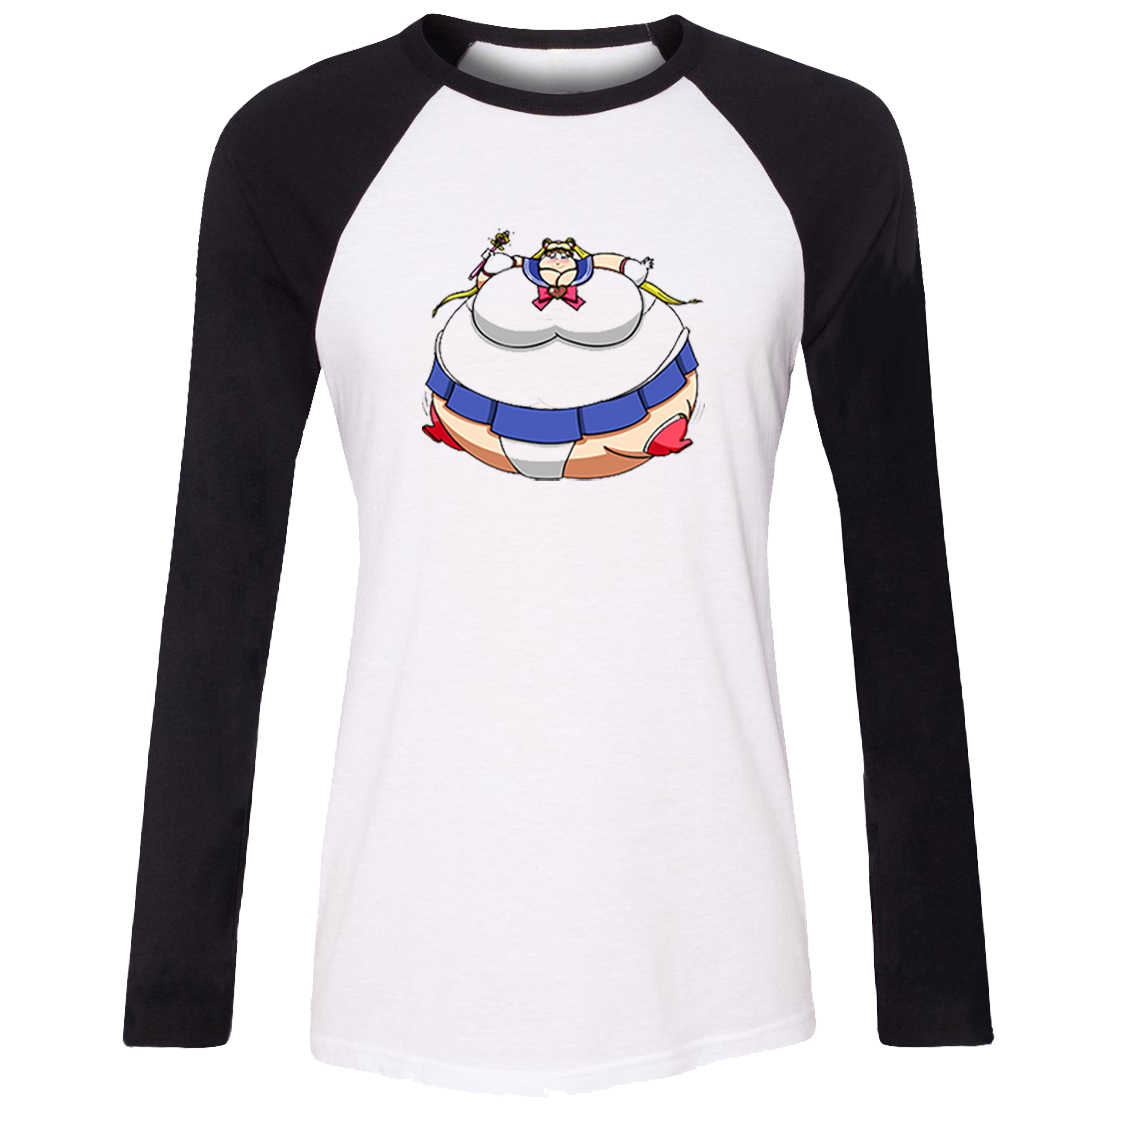 iDzn Women's T-shirt Funny obesity Sailor Moon I Represent The Moon To Destroy You Luna Cat Long Sleeve Girl's T shirt Tee Tops